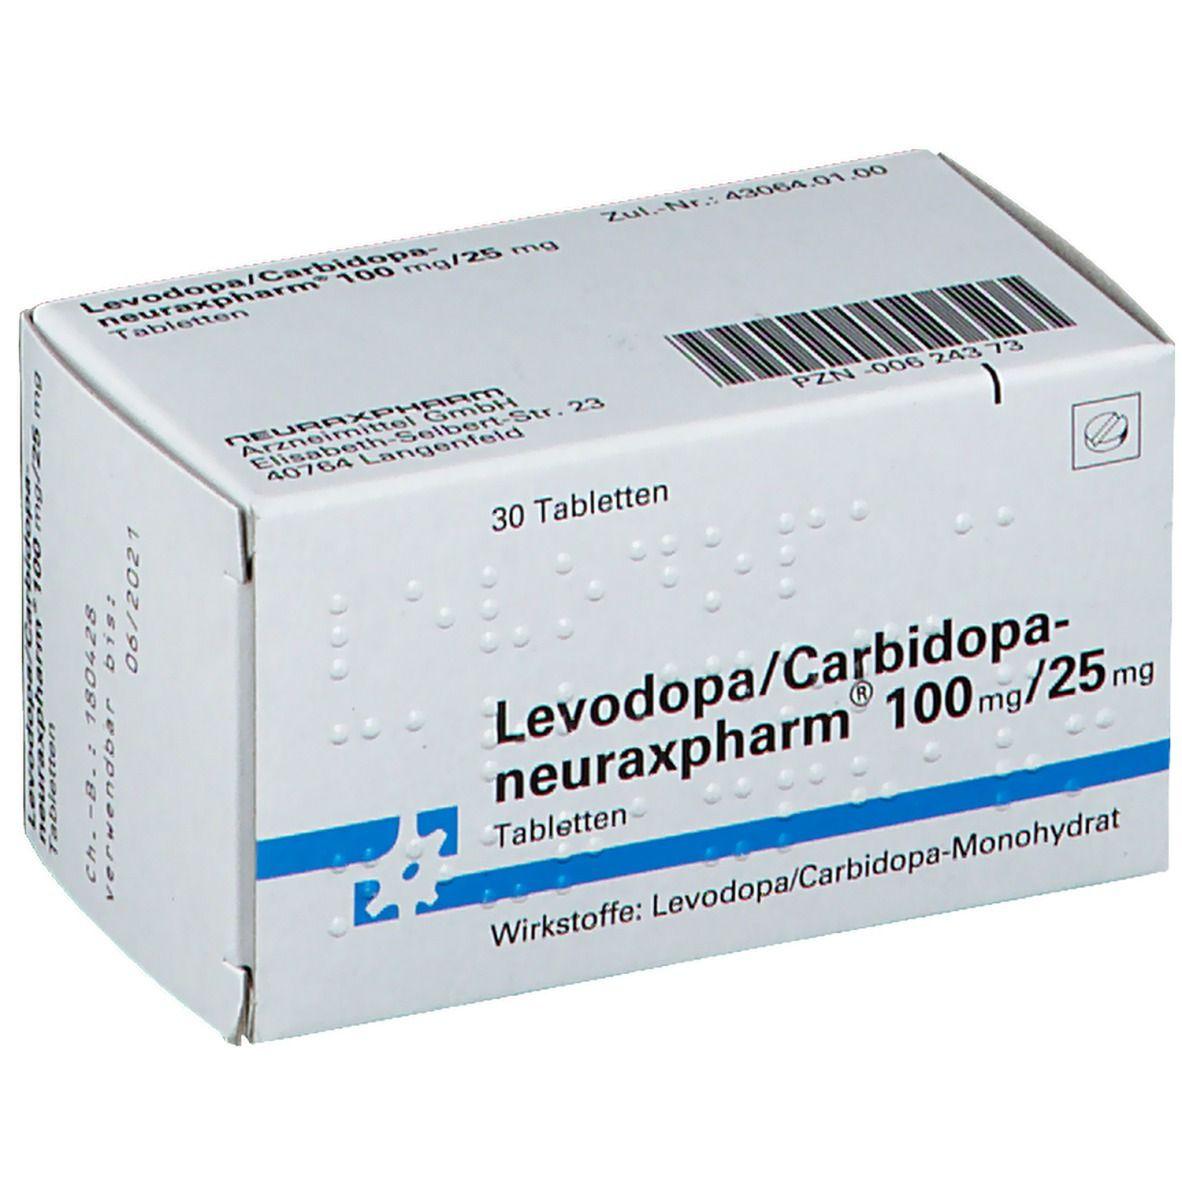 Levodop neuraxpharm 100/25 Tabl.